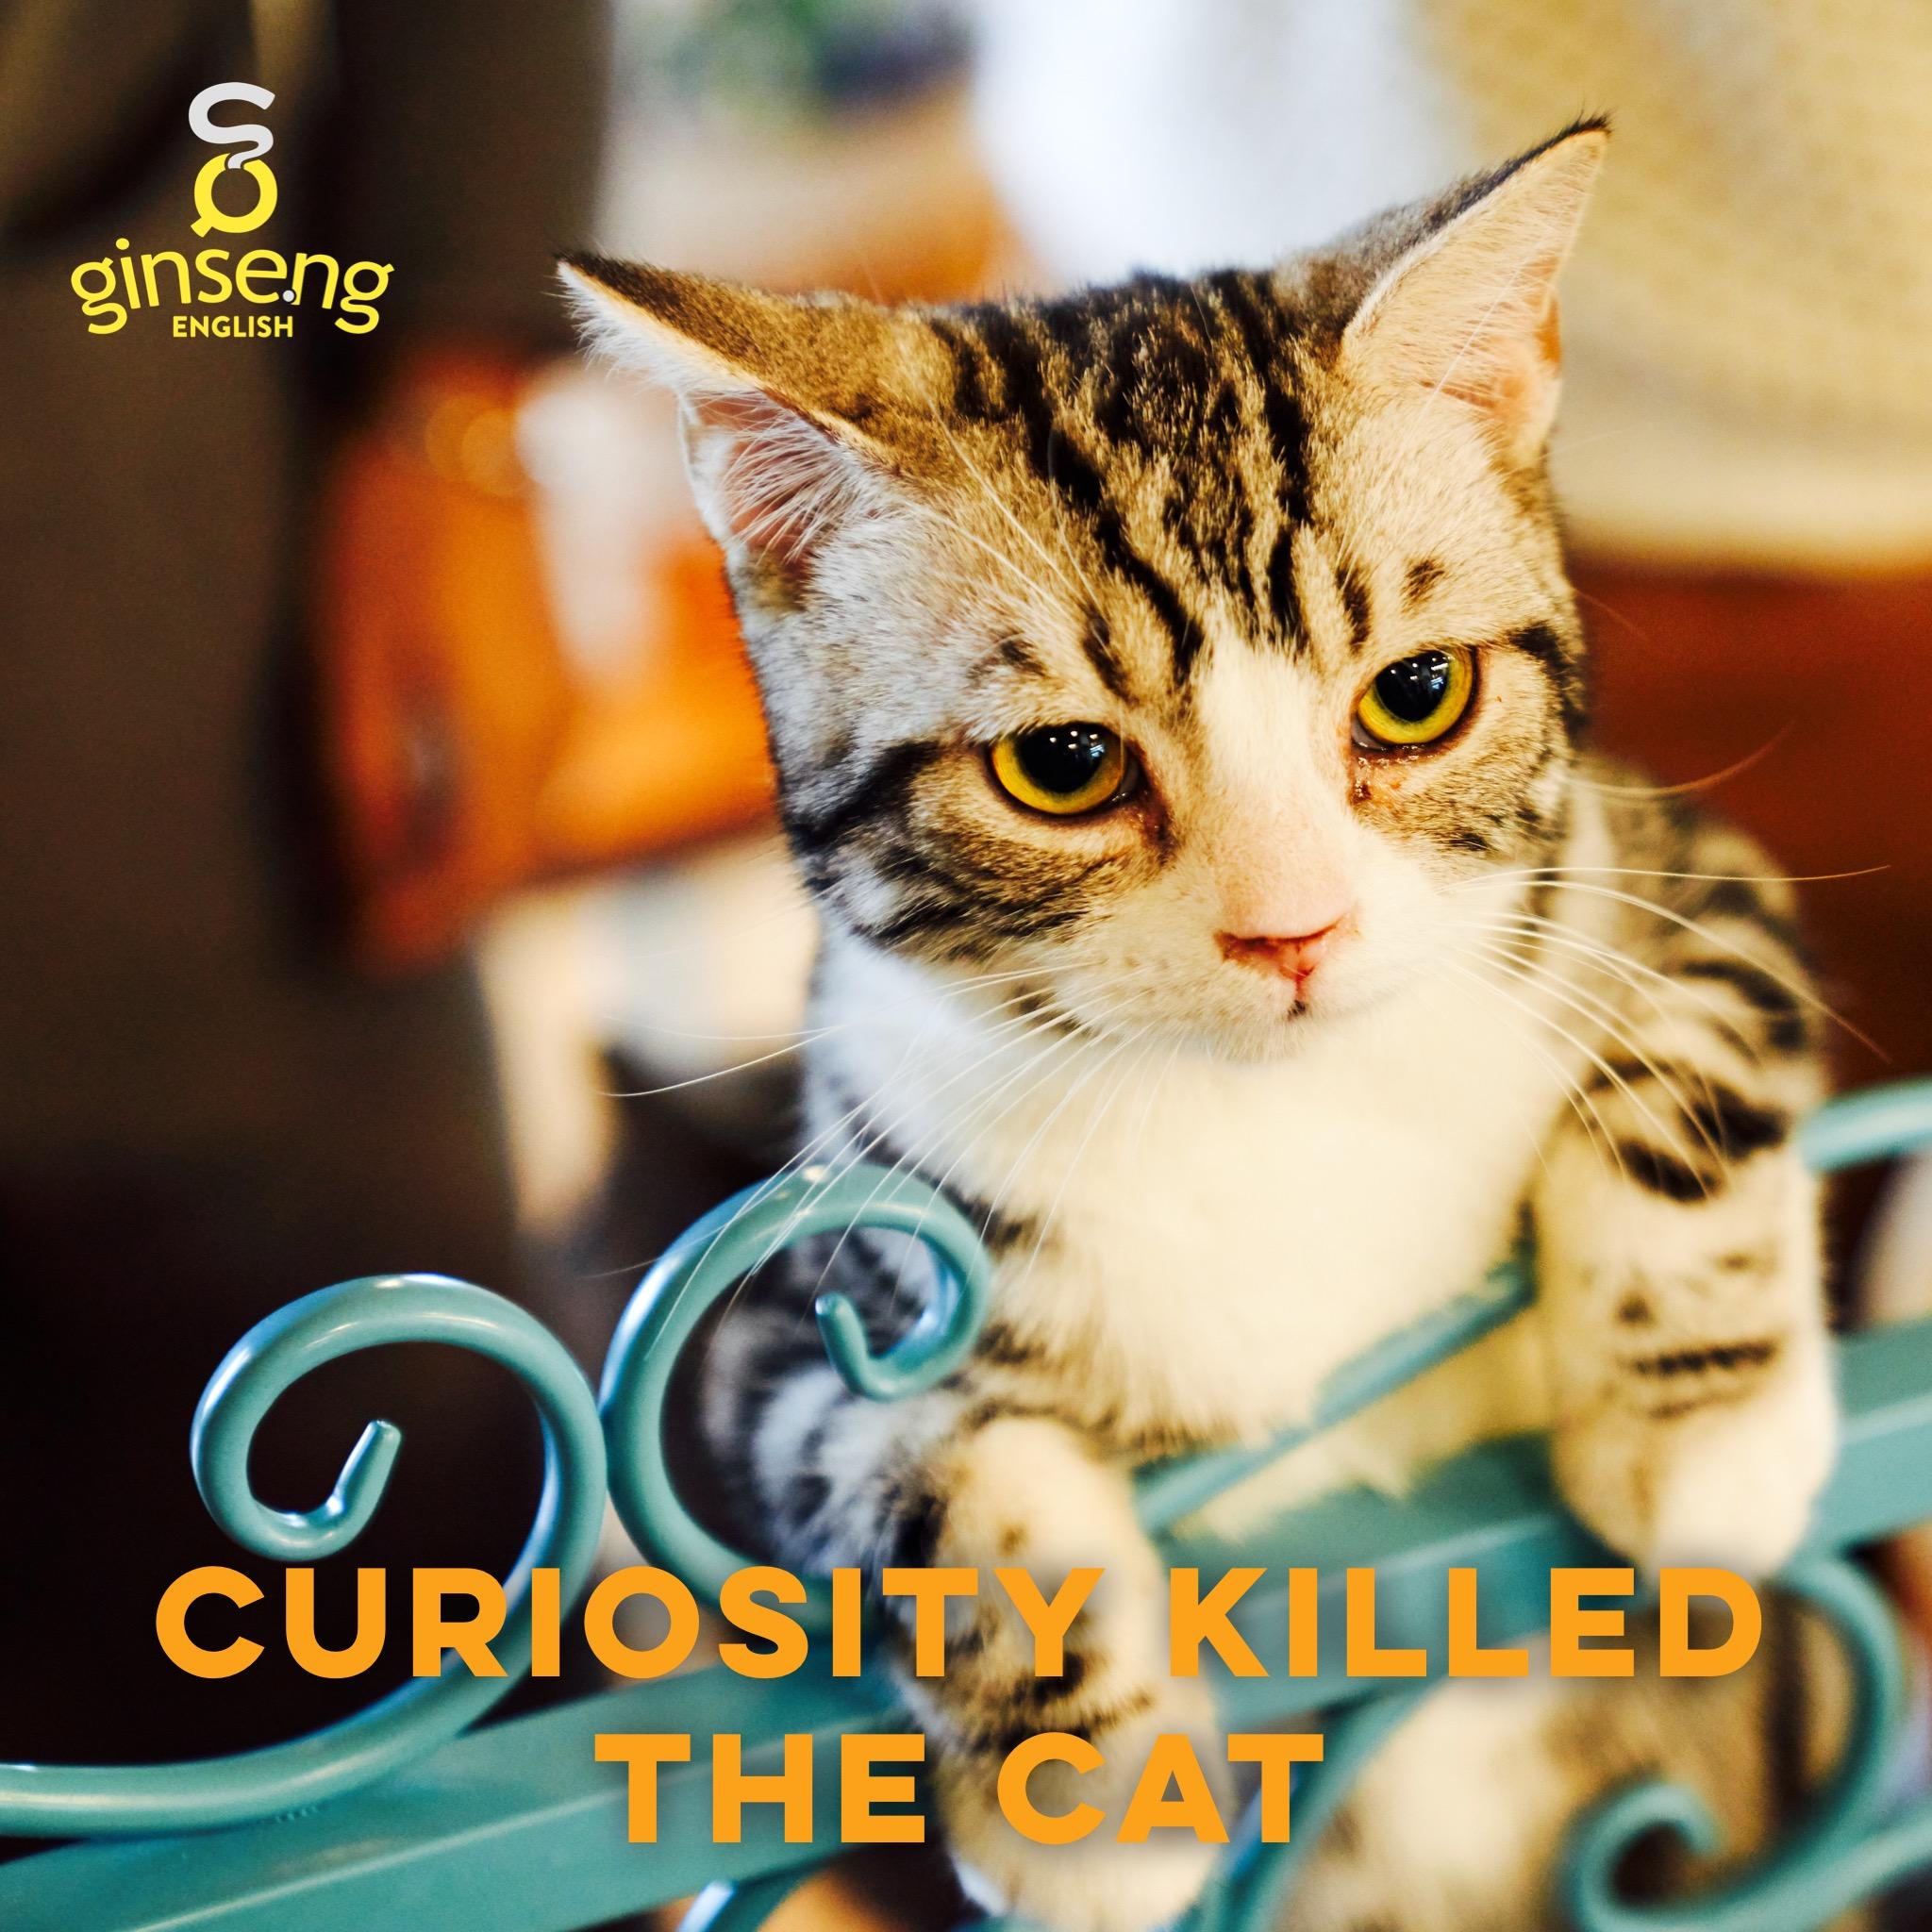 Curiosity Killed the Cat Idiom